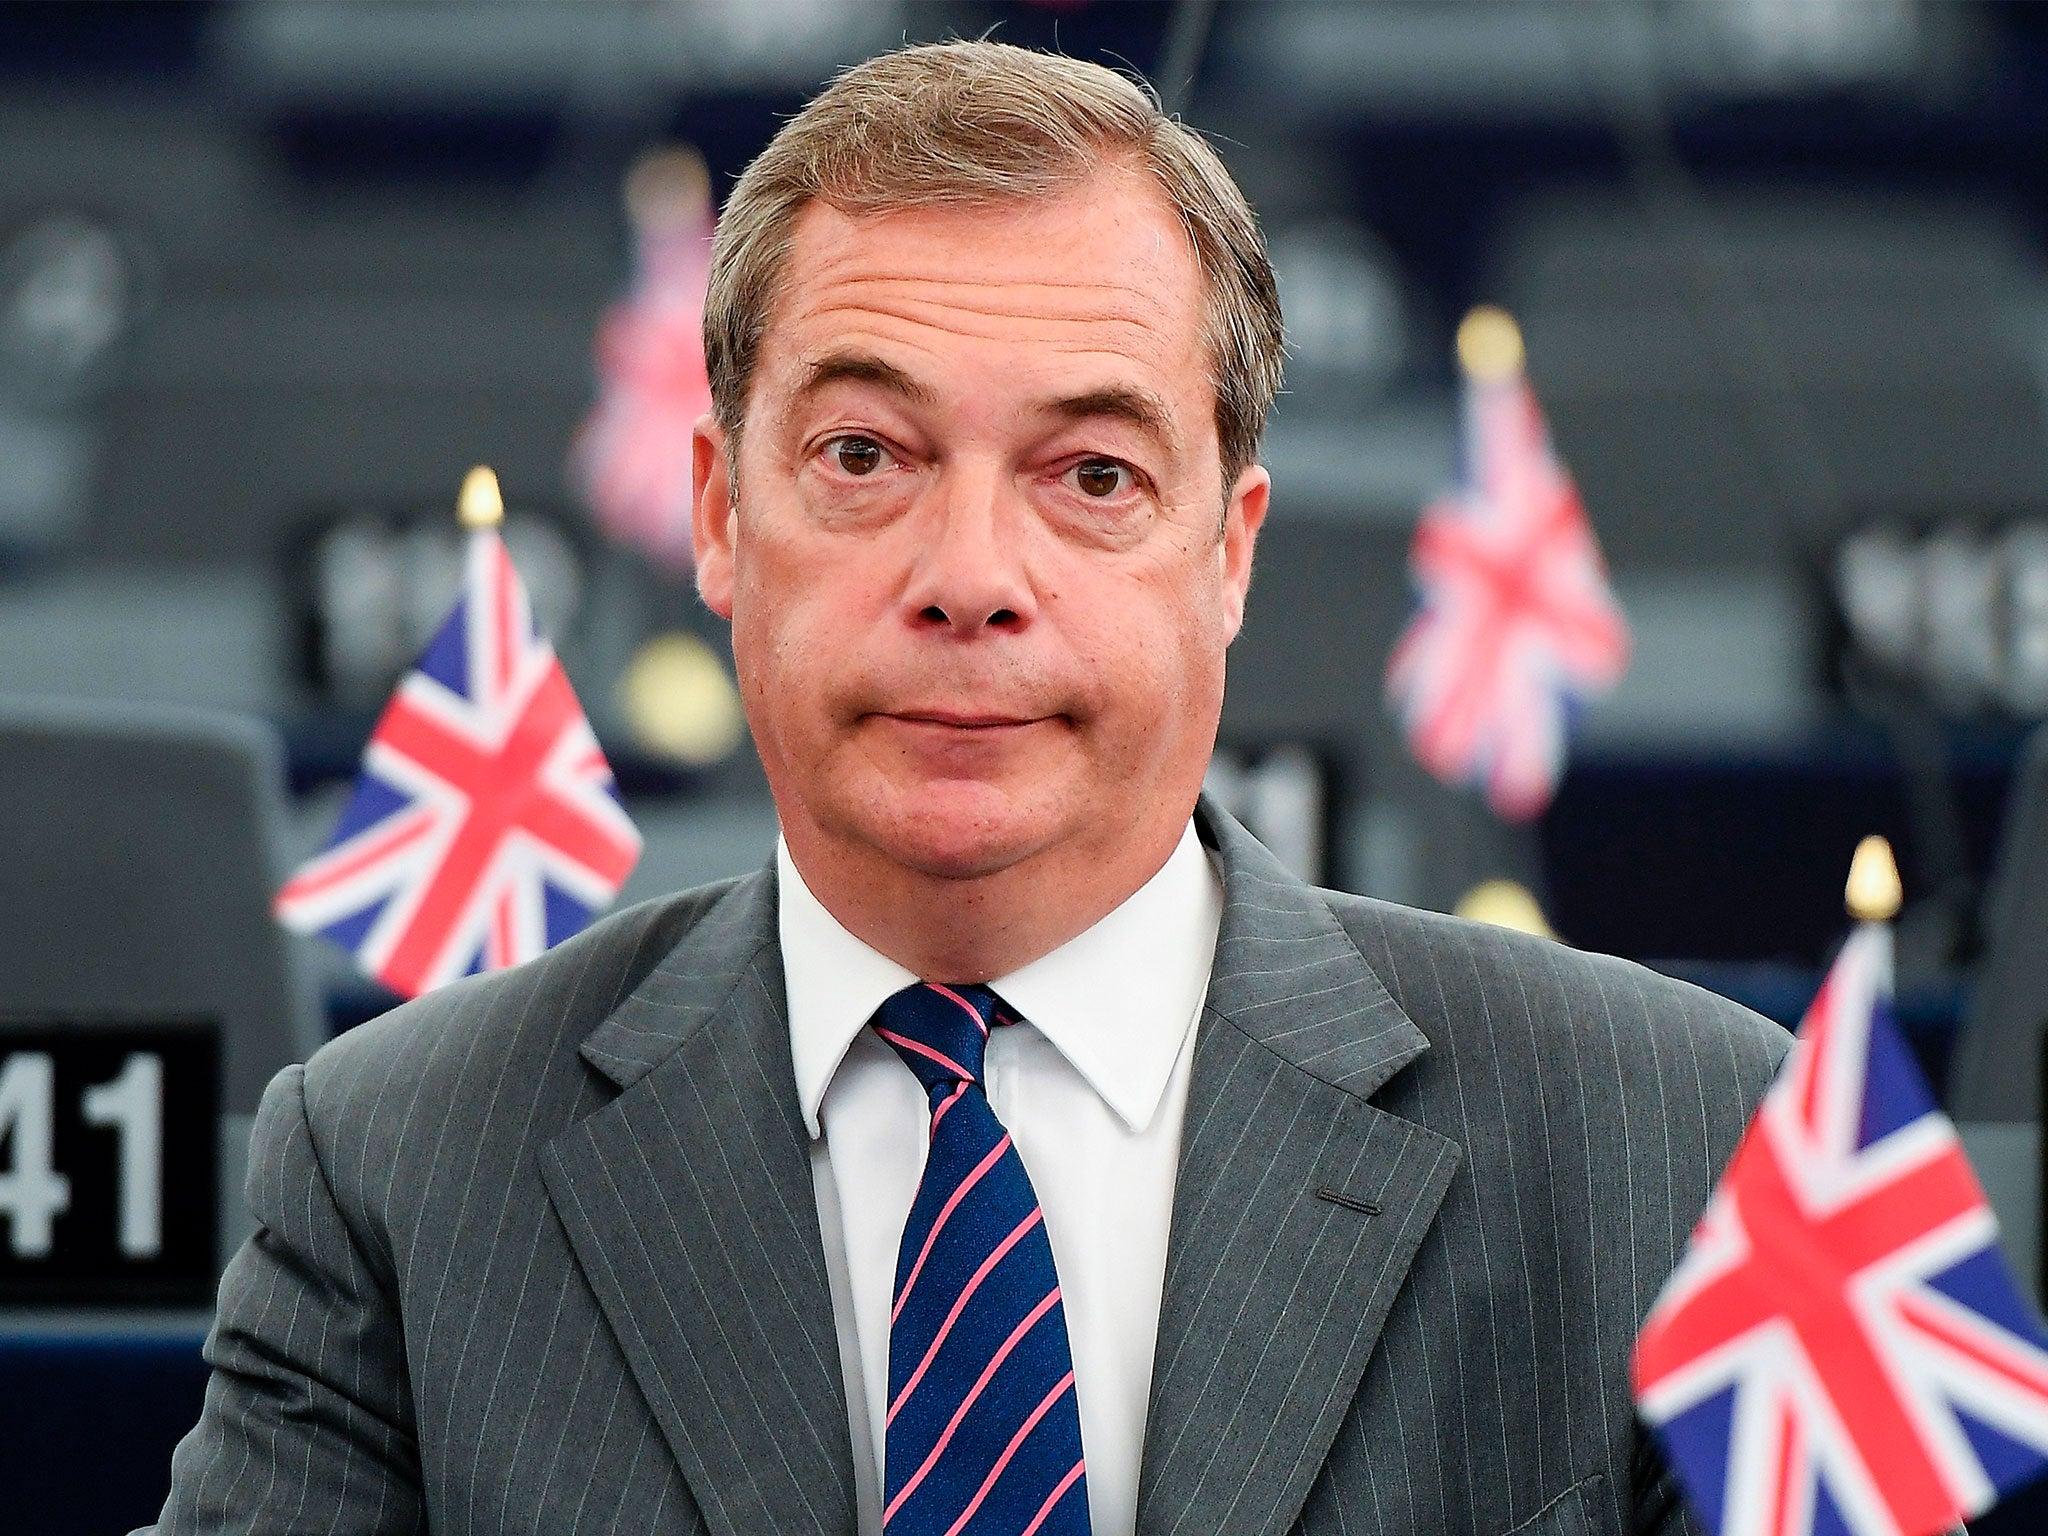 Ukip is finished after electing Gerard Batten, but Nigel Farage is set to make a comeback